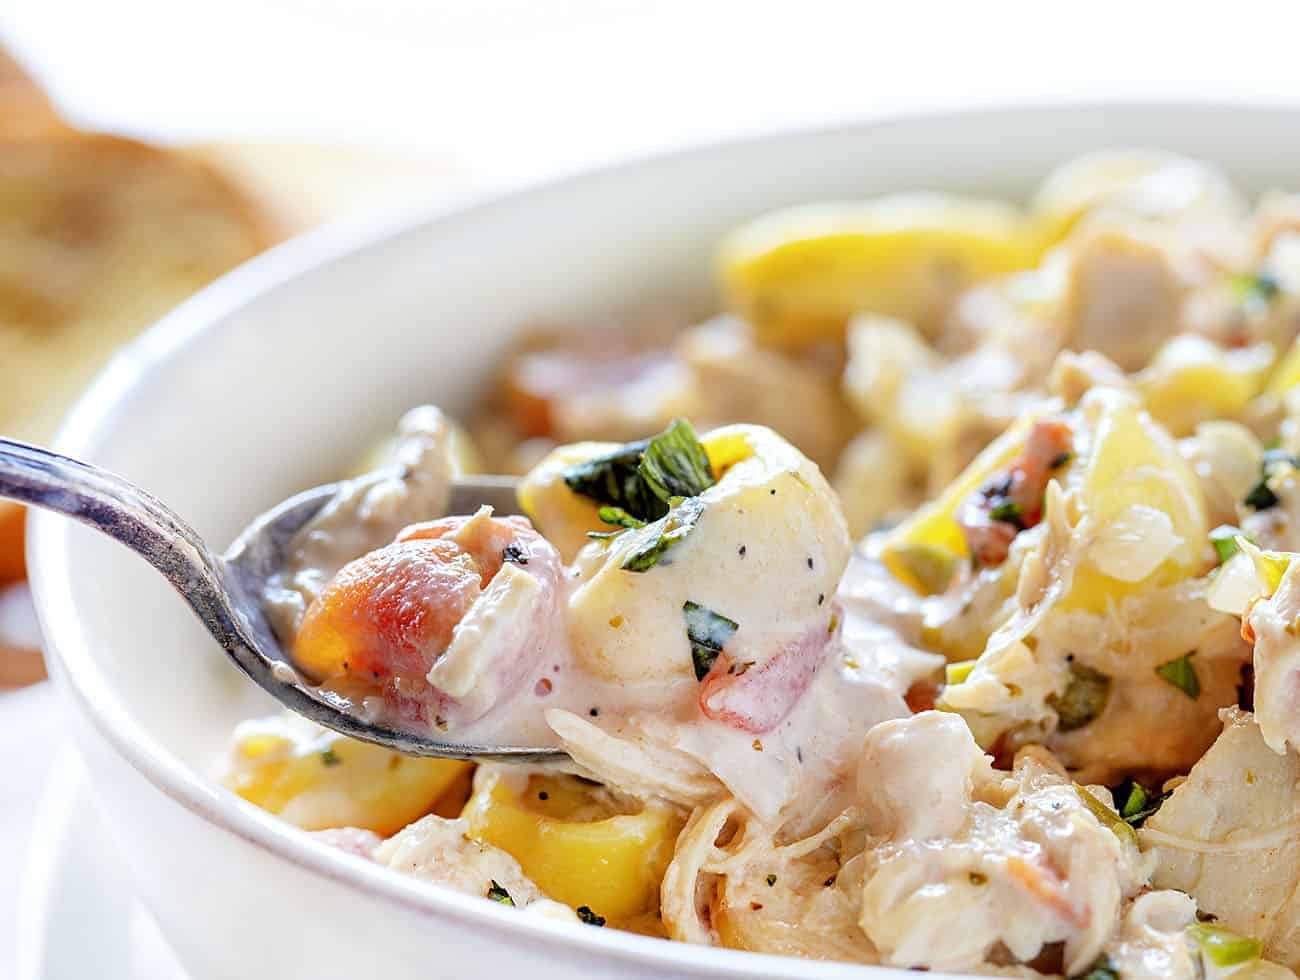 Spoonful of Creamy Chicken Tortellini Soup